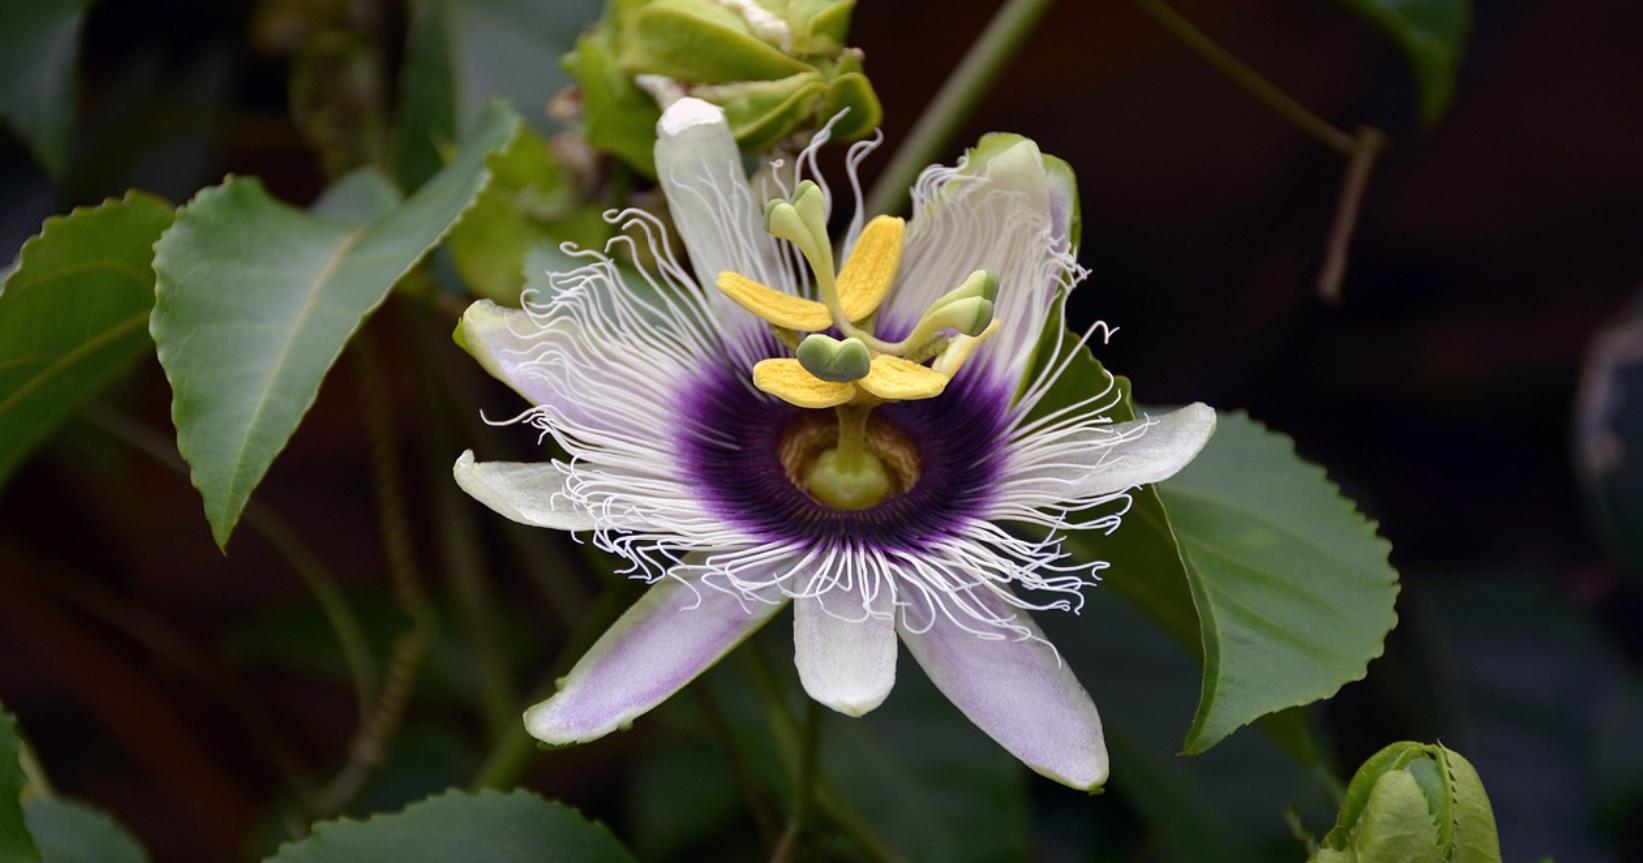 Krishna Kamal: Plants with unique looking pretty flowers